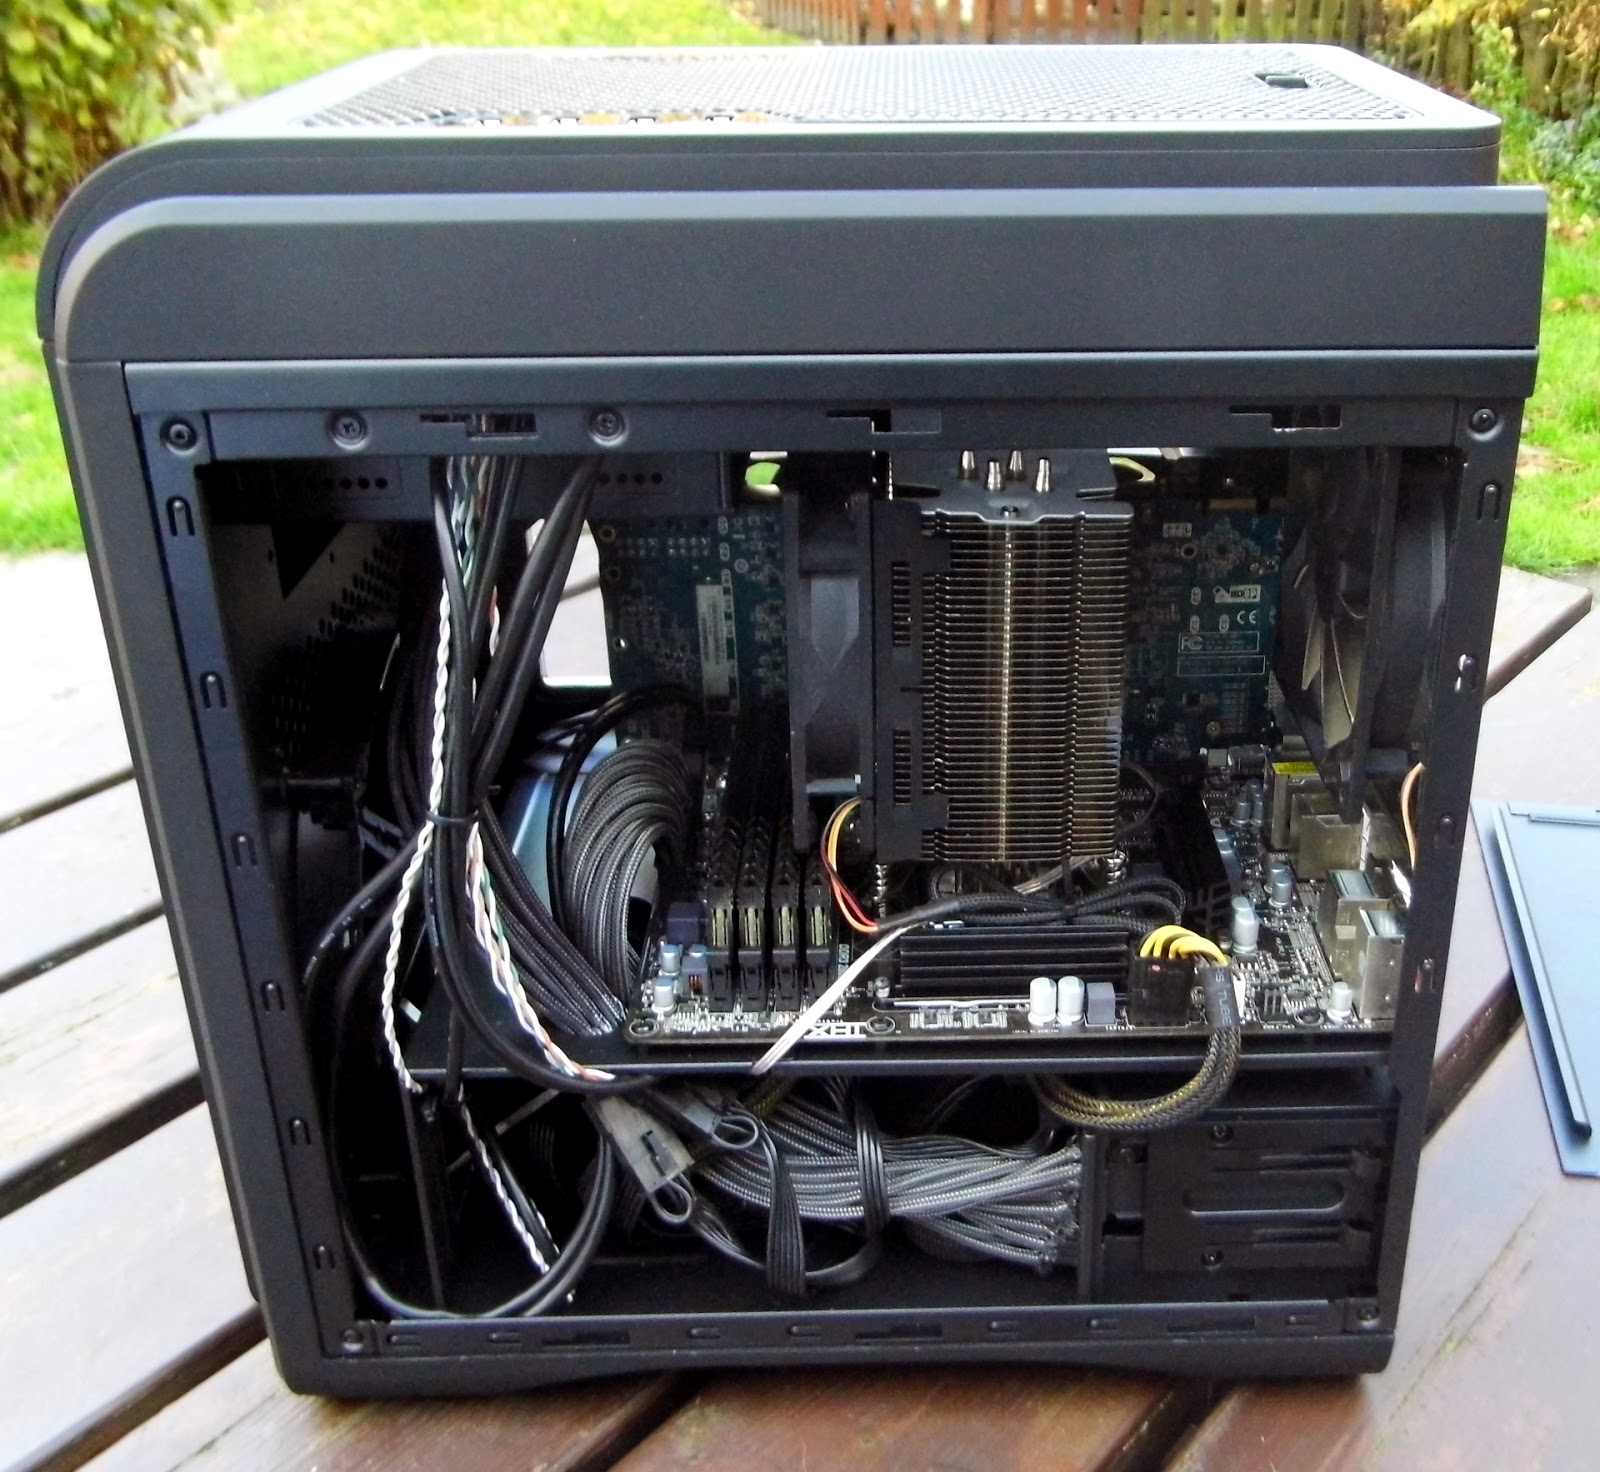 la-centrale-du-hardware-test-boitier-aerocol-ds-dead-silence-cube-montage